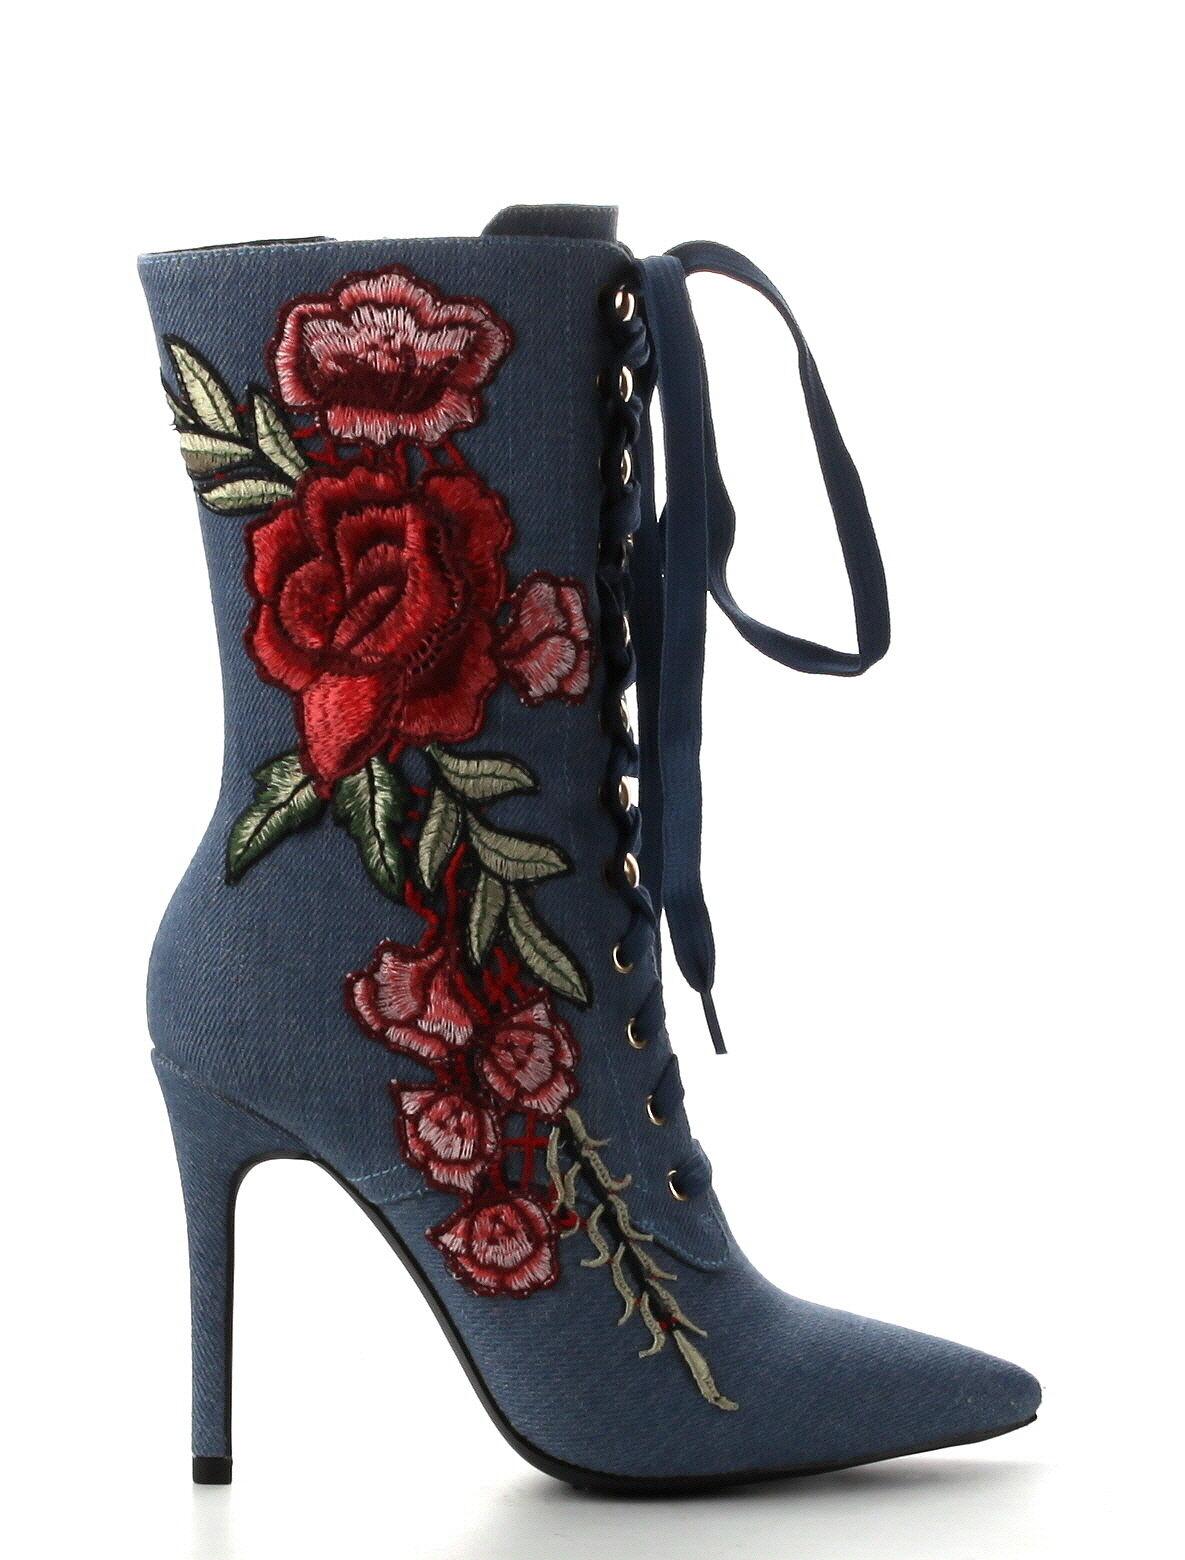 NEU Cape Robbin Mini 108 Blau Denim EmbroideROT Roses Ankle Stiefel 5.5 - 10 US